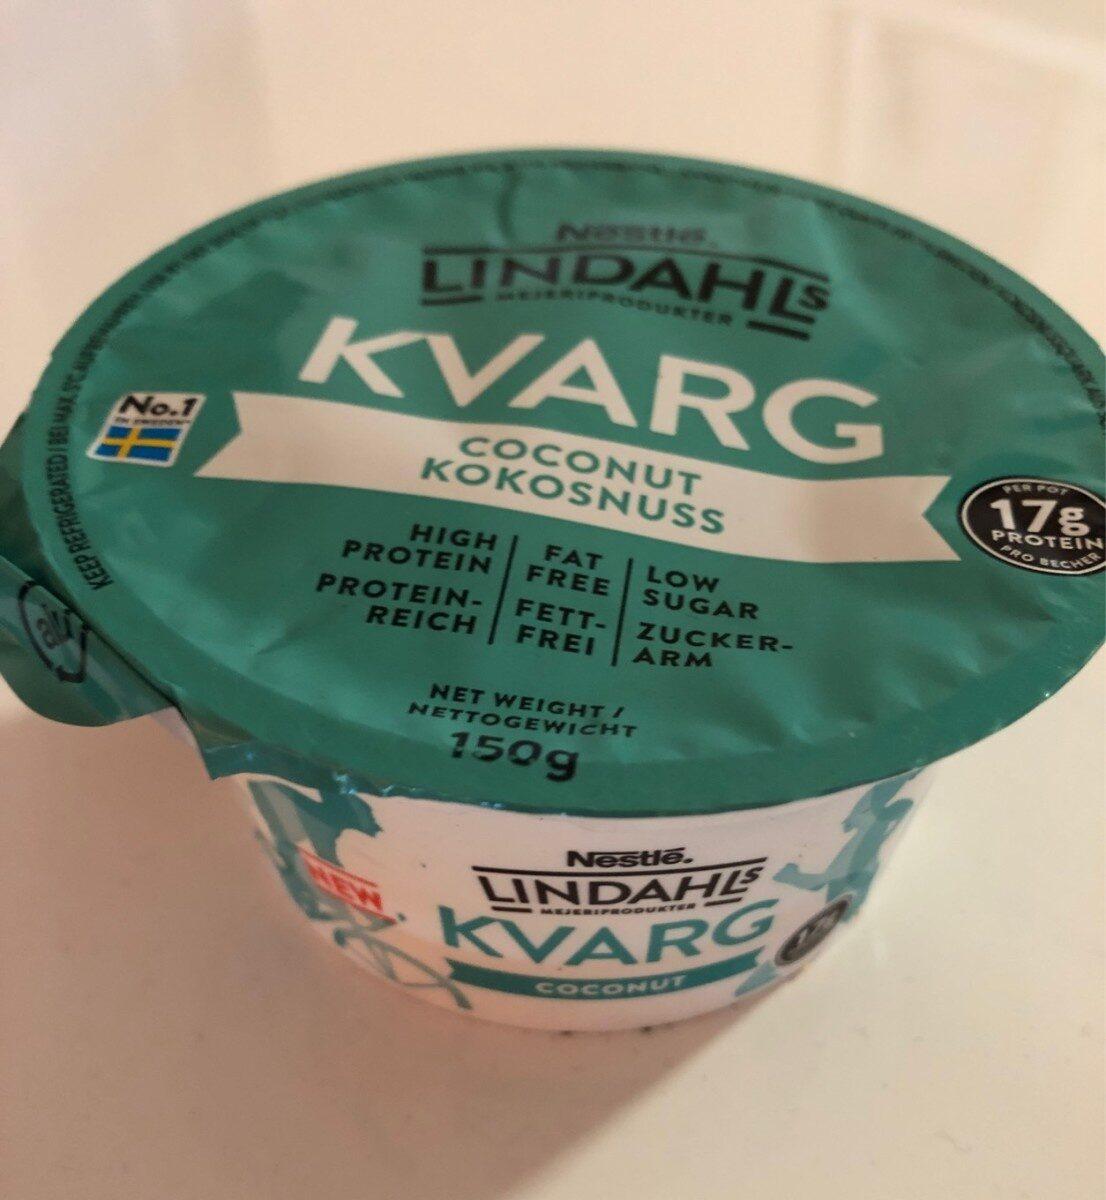 KVARG Coconut - Product - fr